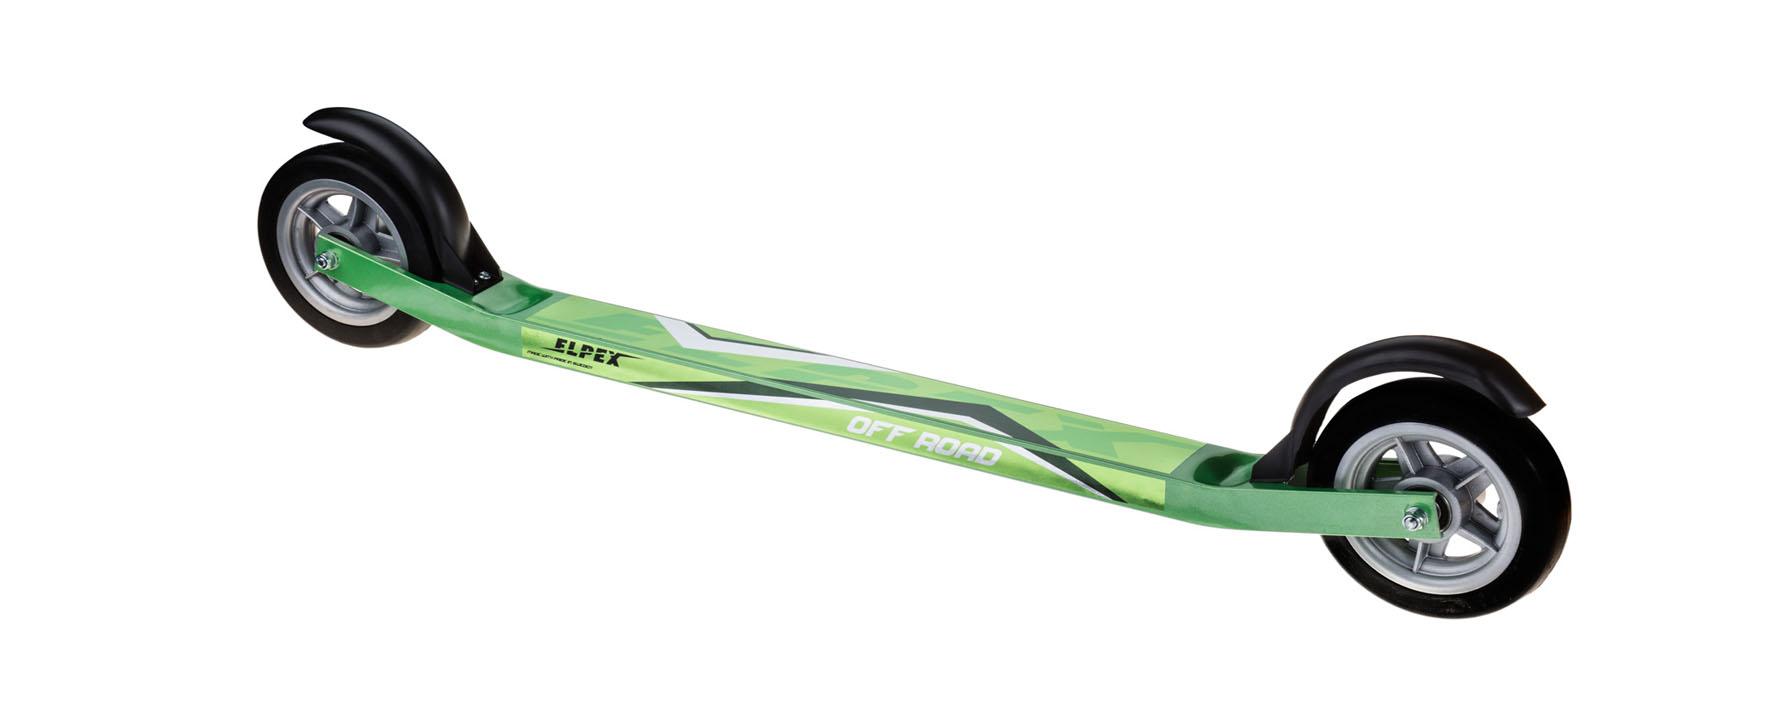 Elpex Off-Road ski